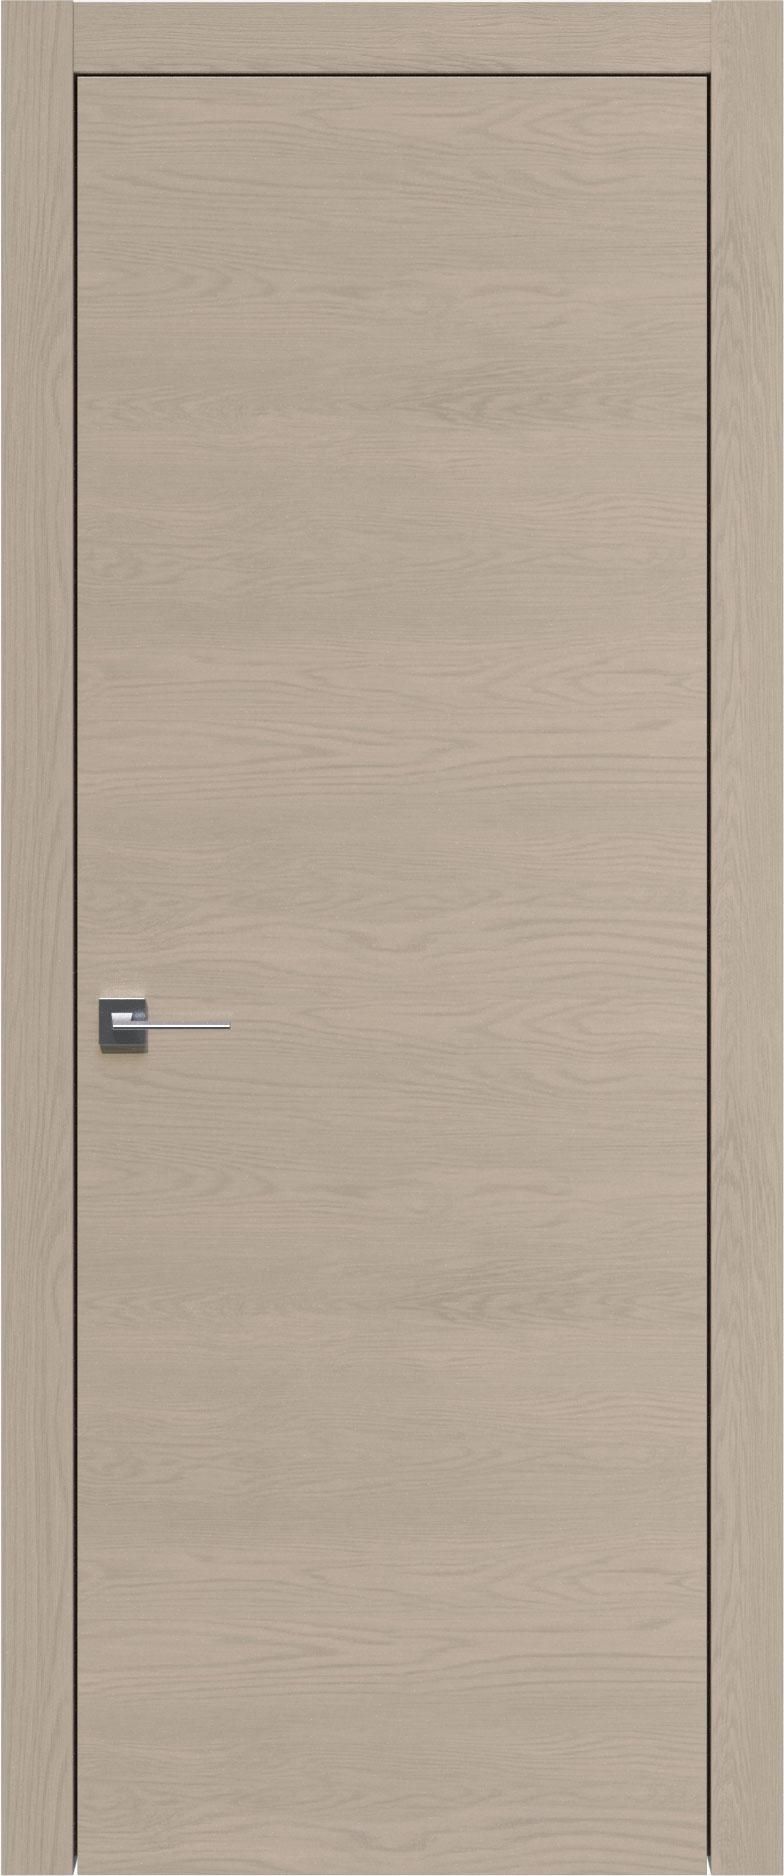 Tivoli А-2 цвет - Дуб муар Без стекла (ДГ)